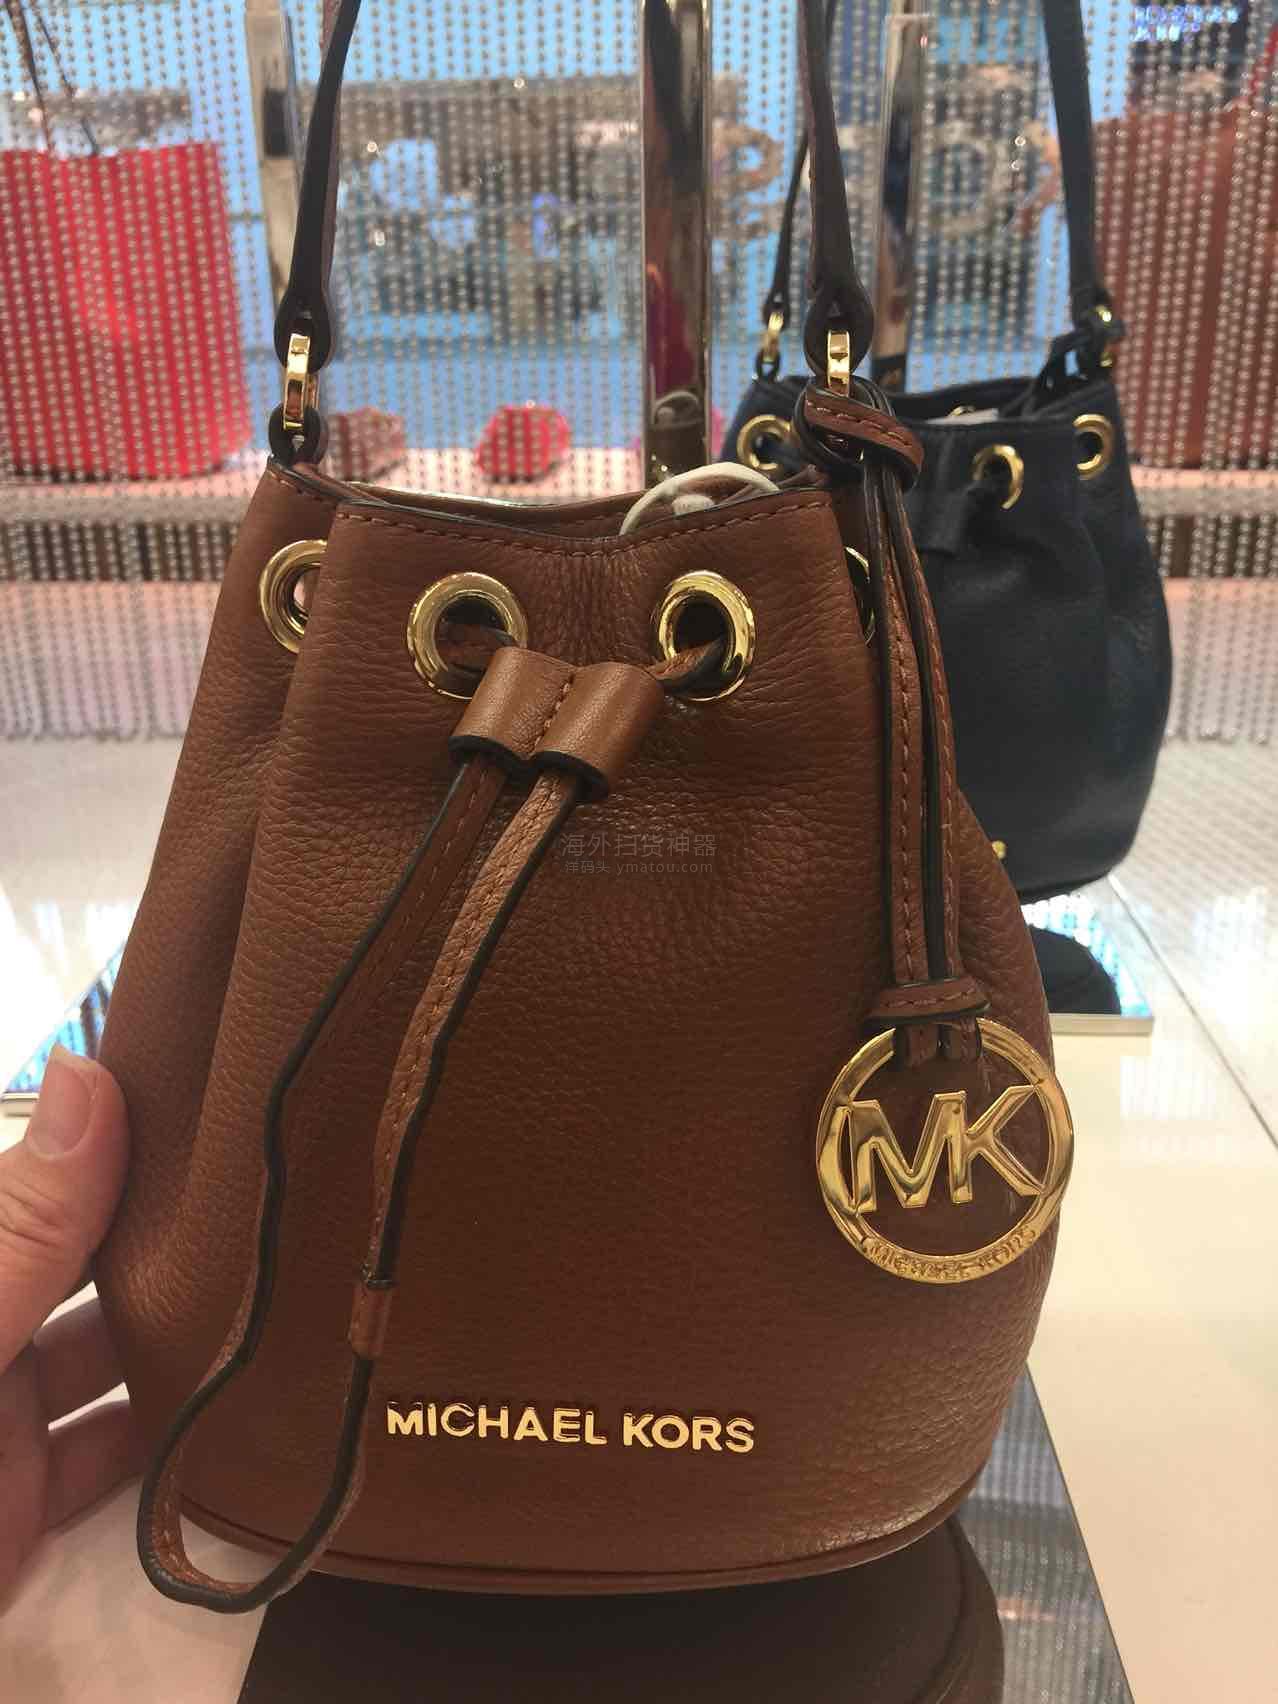 MK 迷你水桶包,折上折。价格不等人咯! 藏蓝色